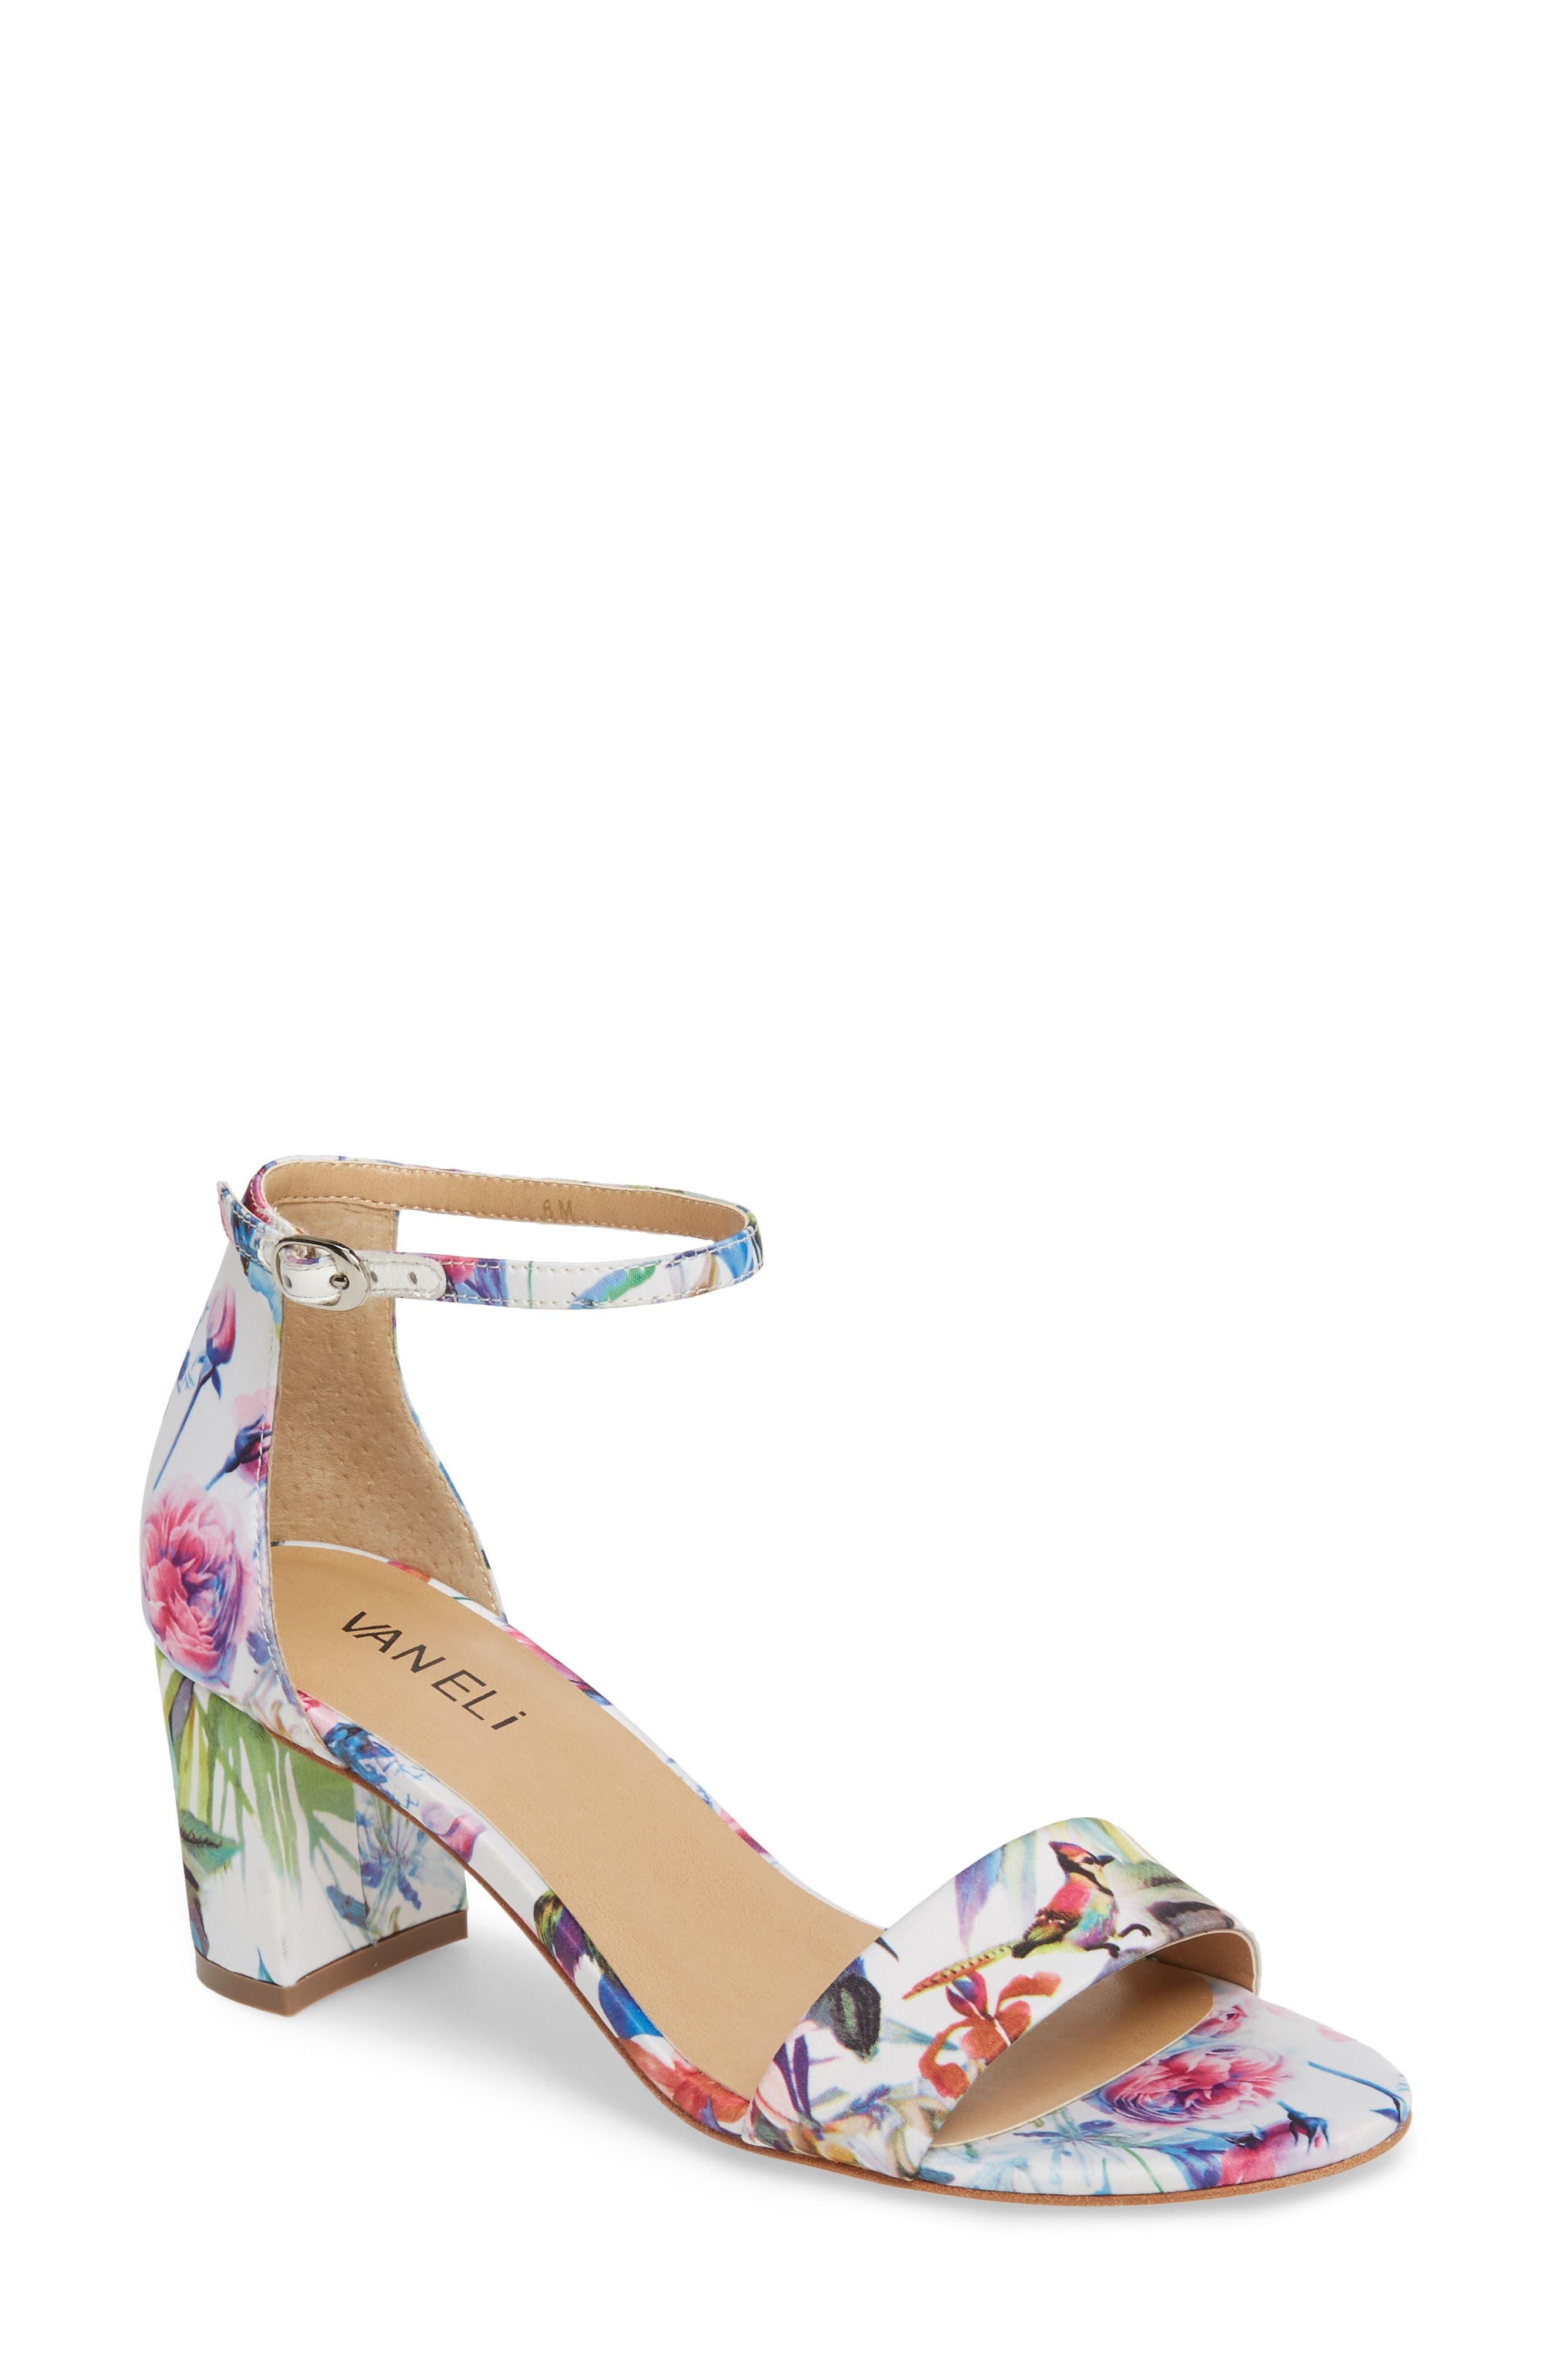 Meres Ankle Strap Sandal,                         Main,                         color, 400